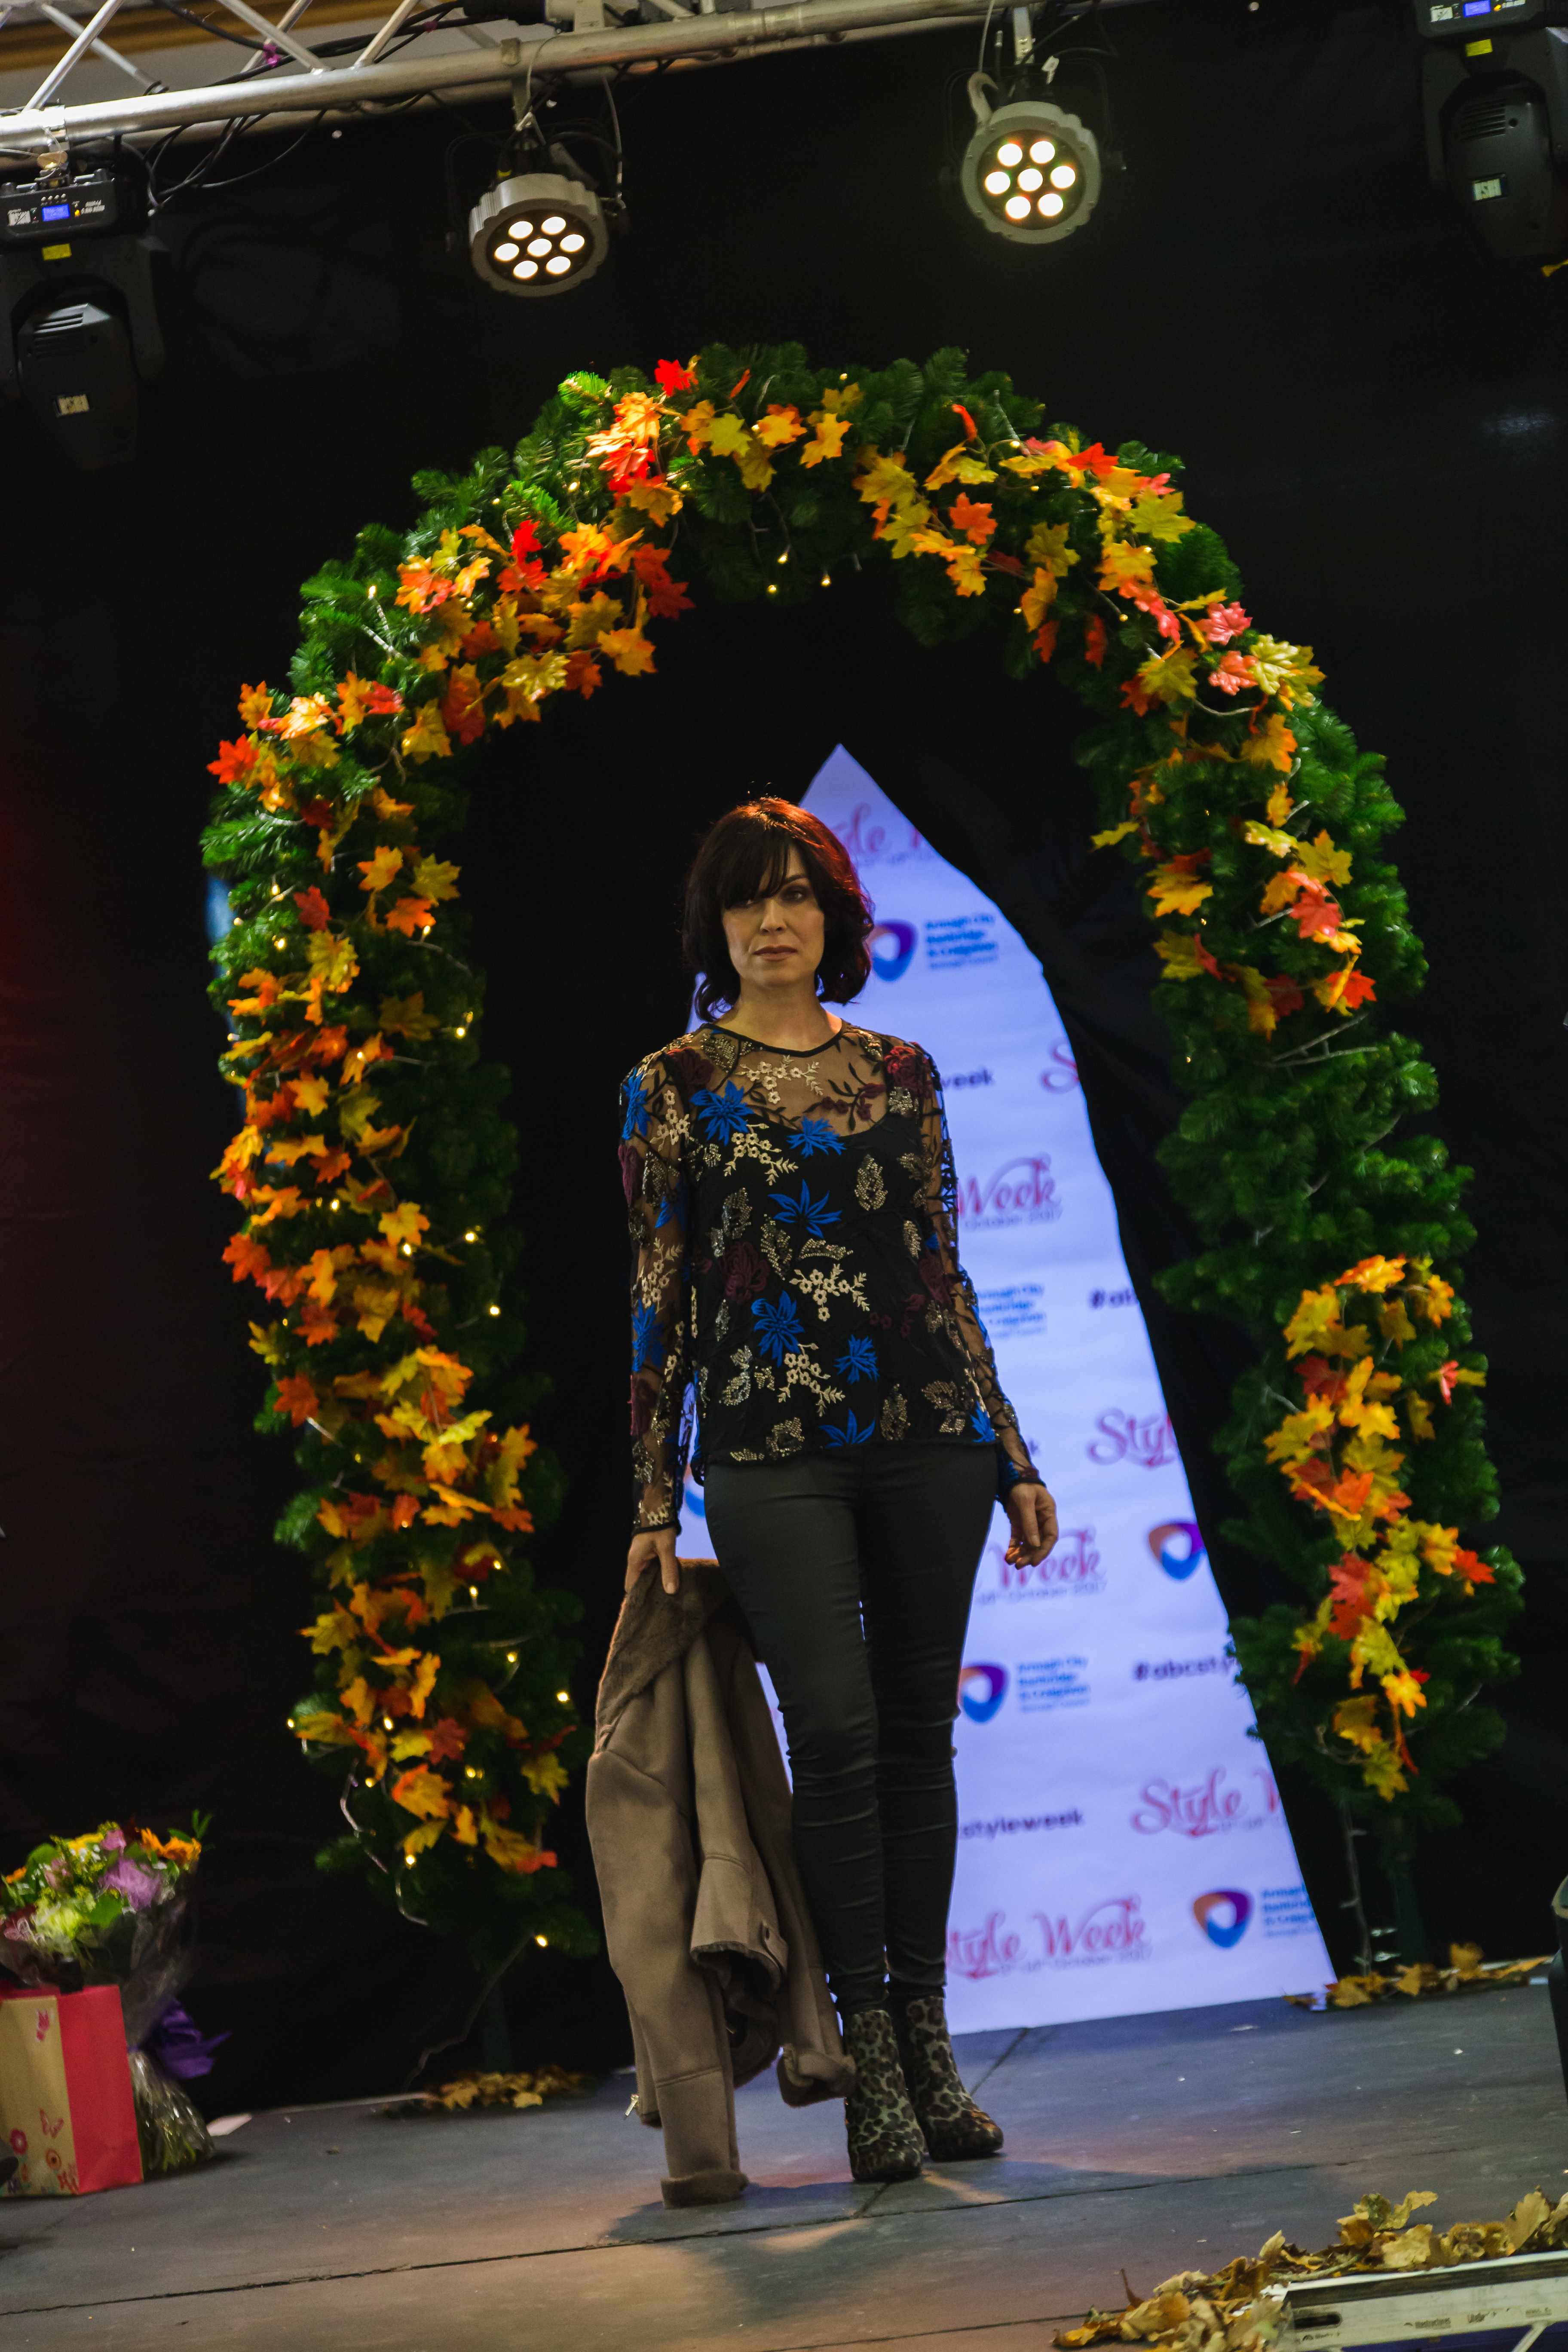 ABC Style Week 2017